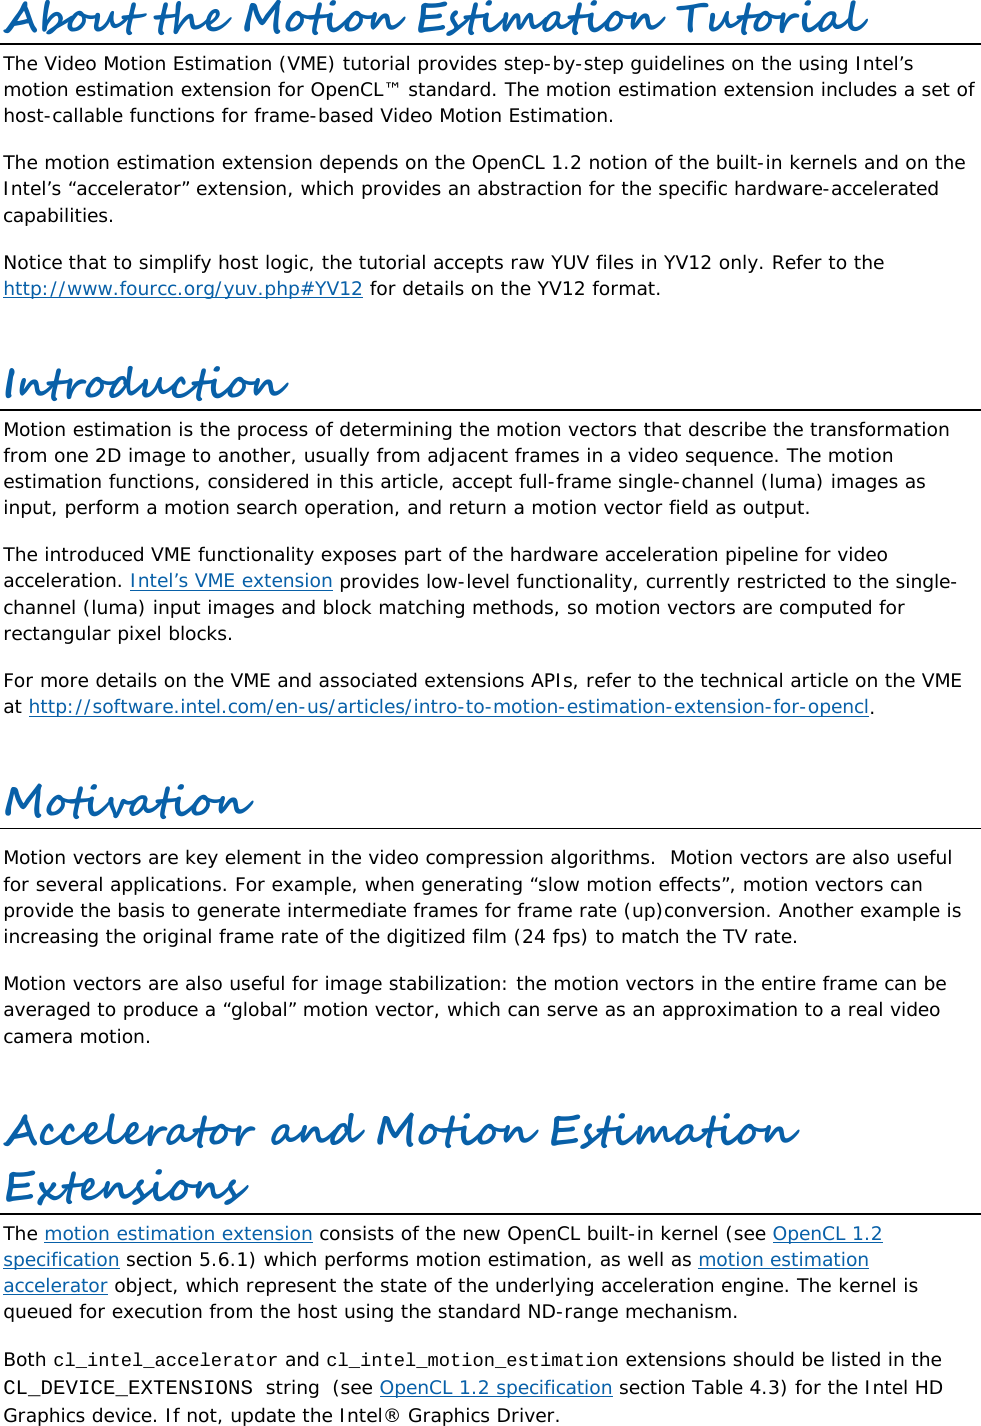 Video Motion Estimation Tutorial User Guide